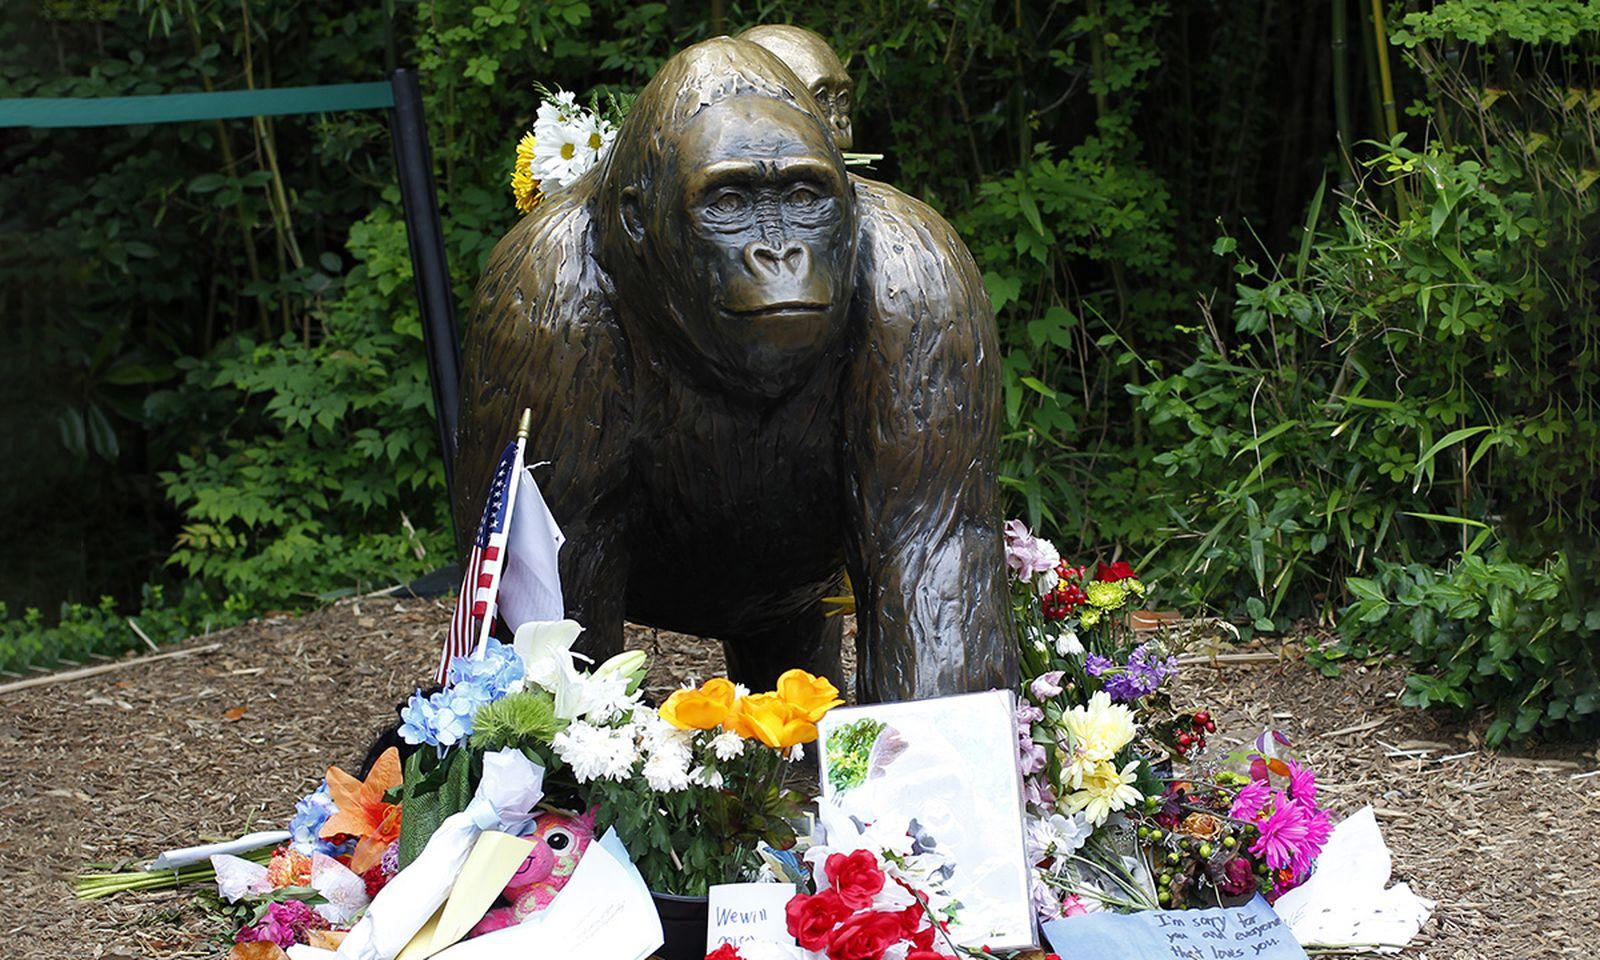 Flowers lay around a bronze statue of a gorilla